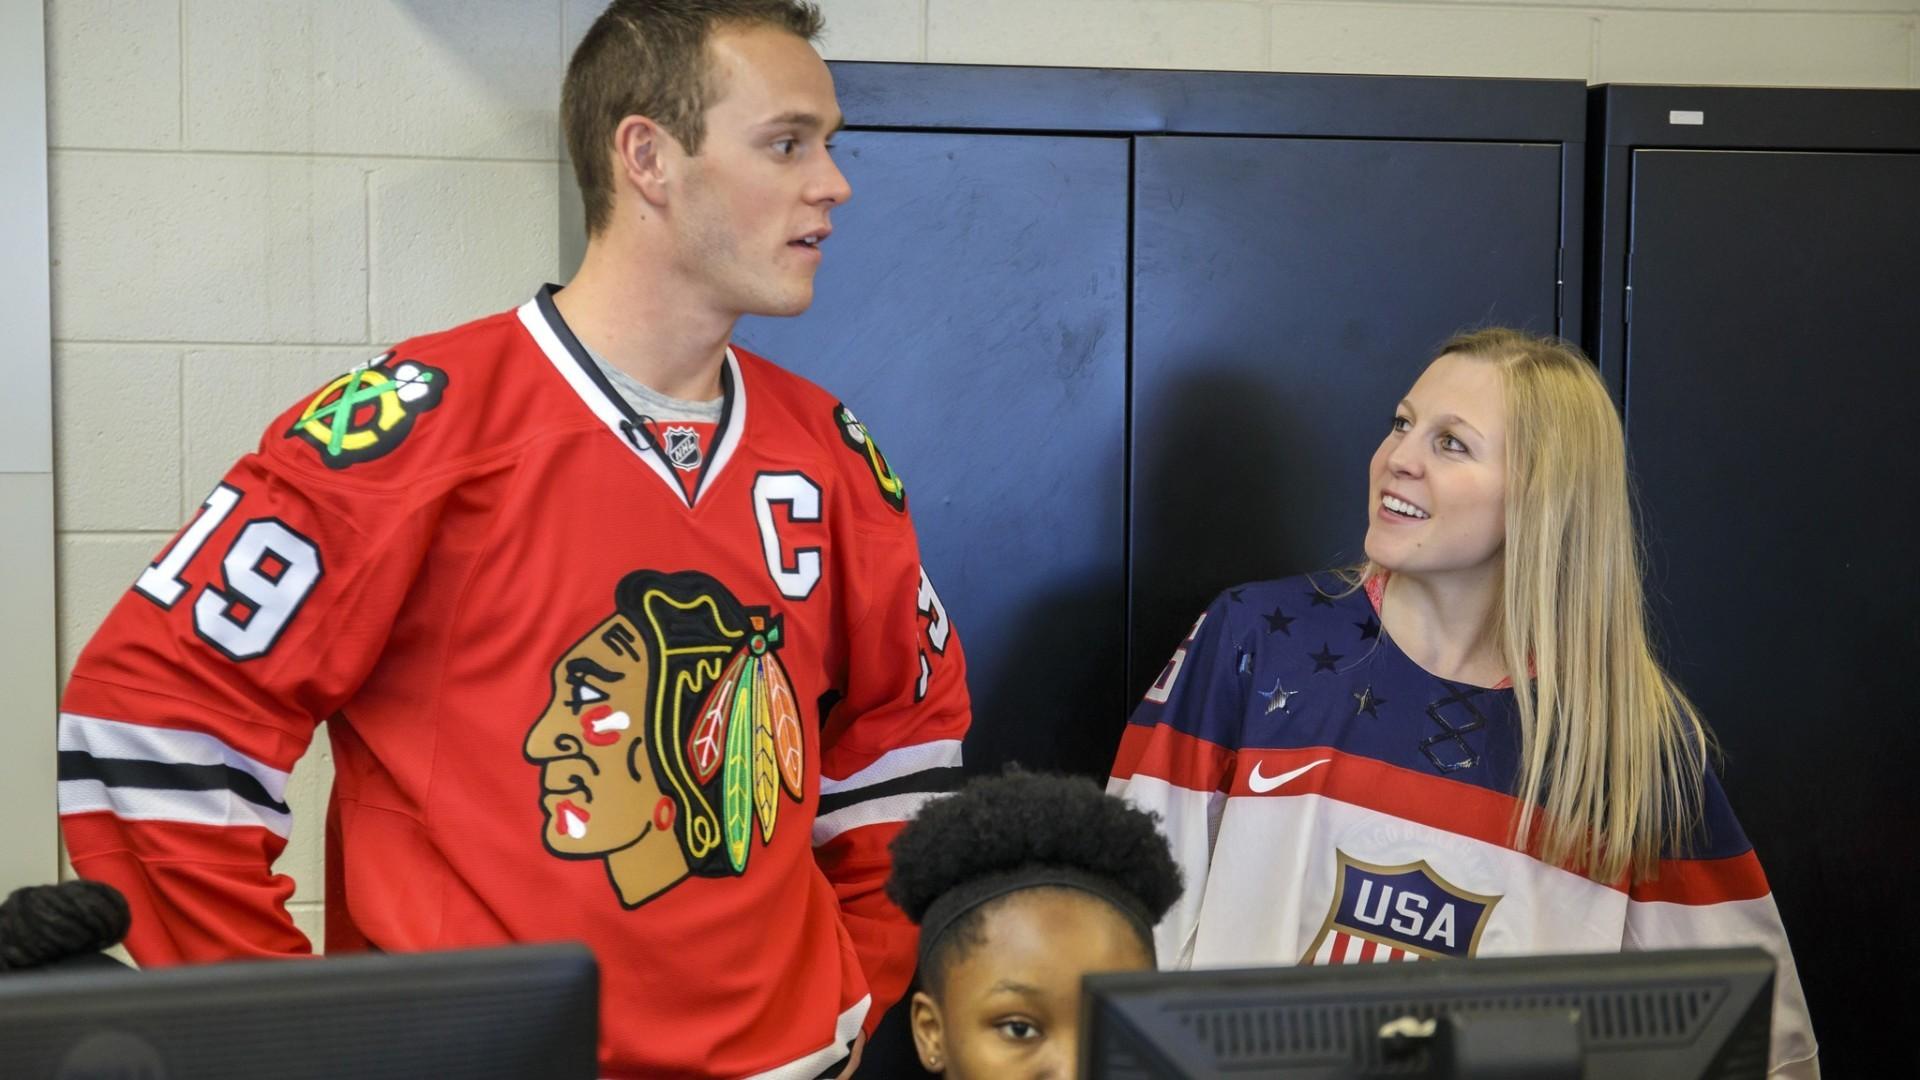 blackhawks jonathan toews and team usa hockey s kendall coyne visit